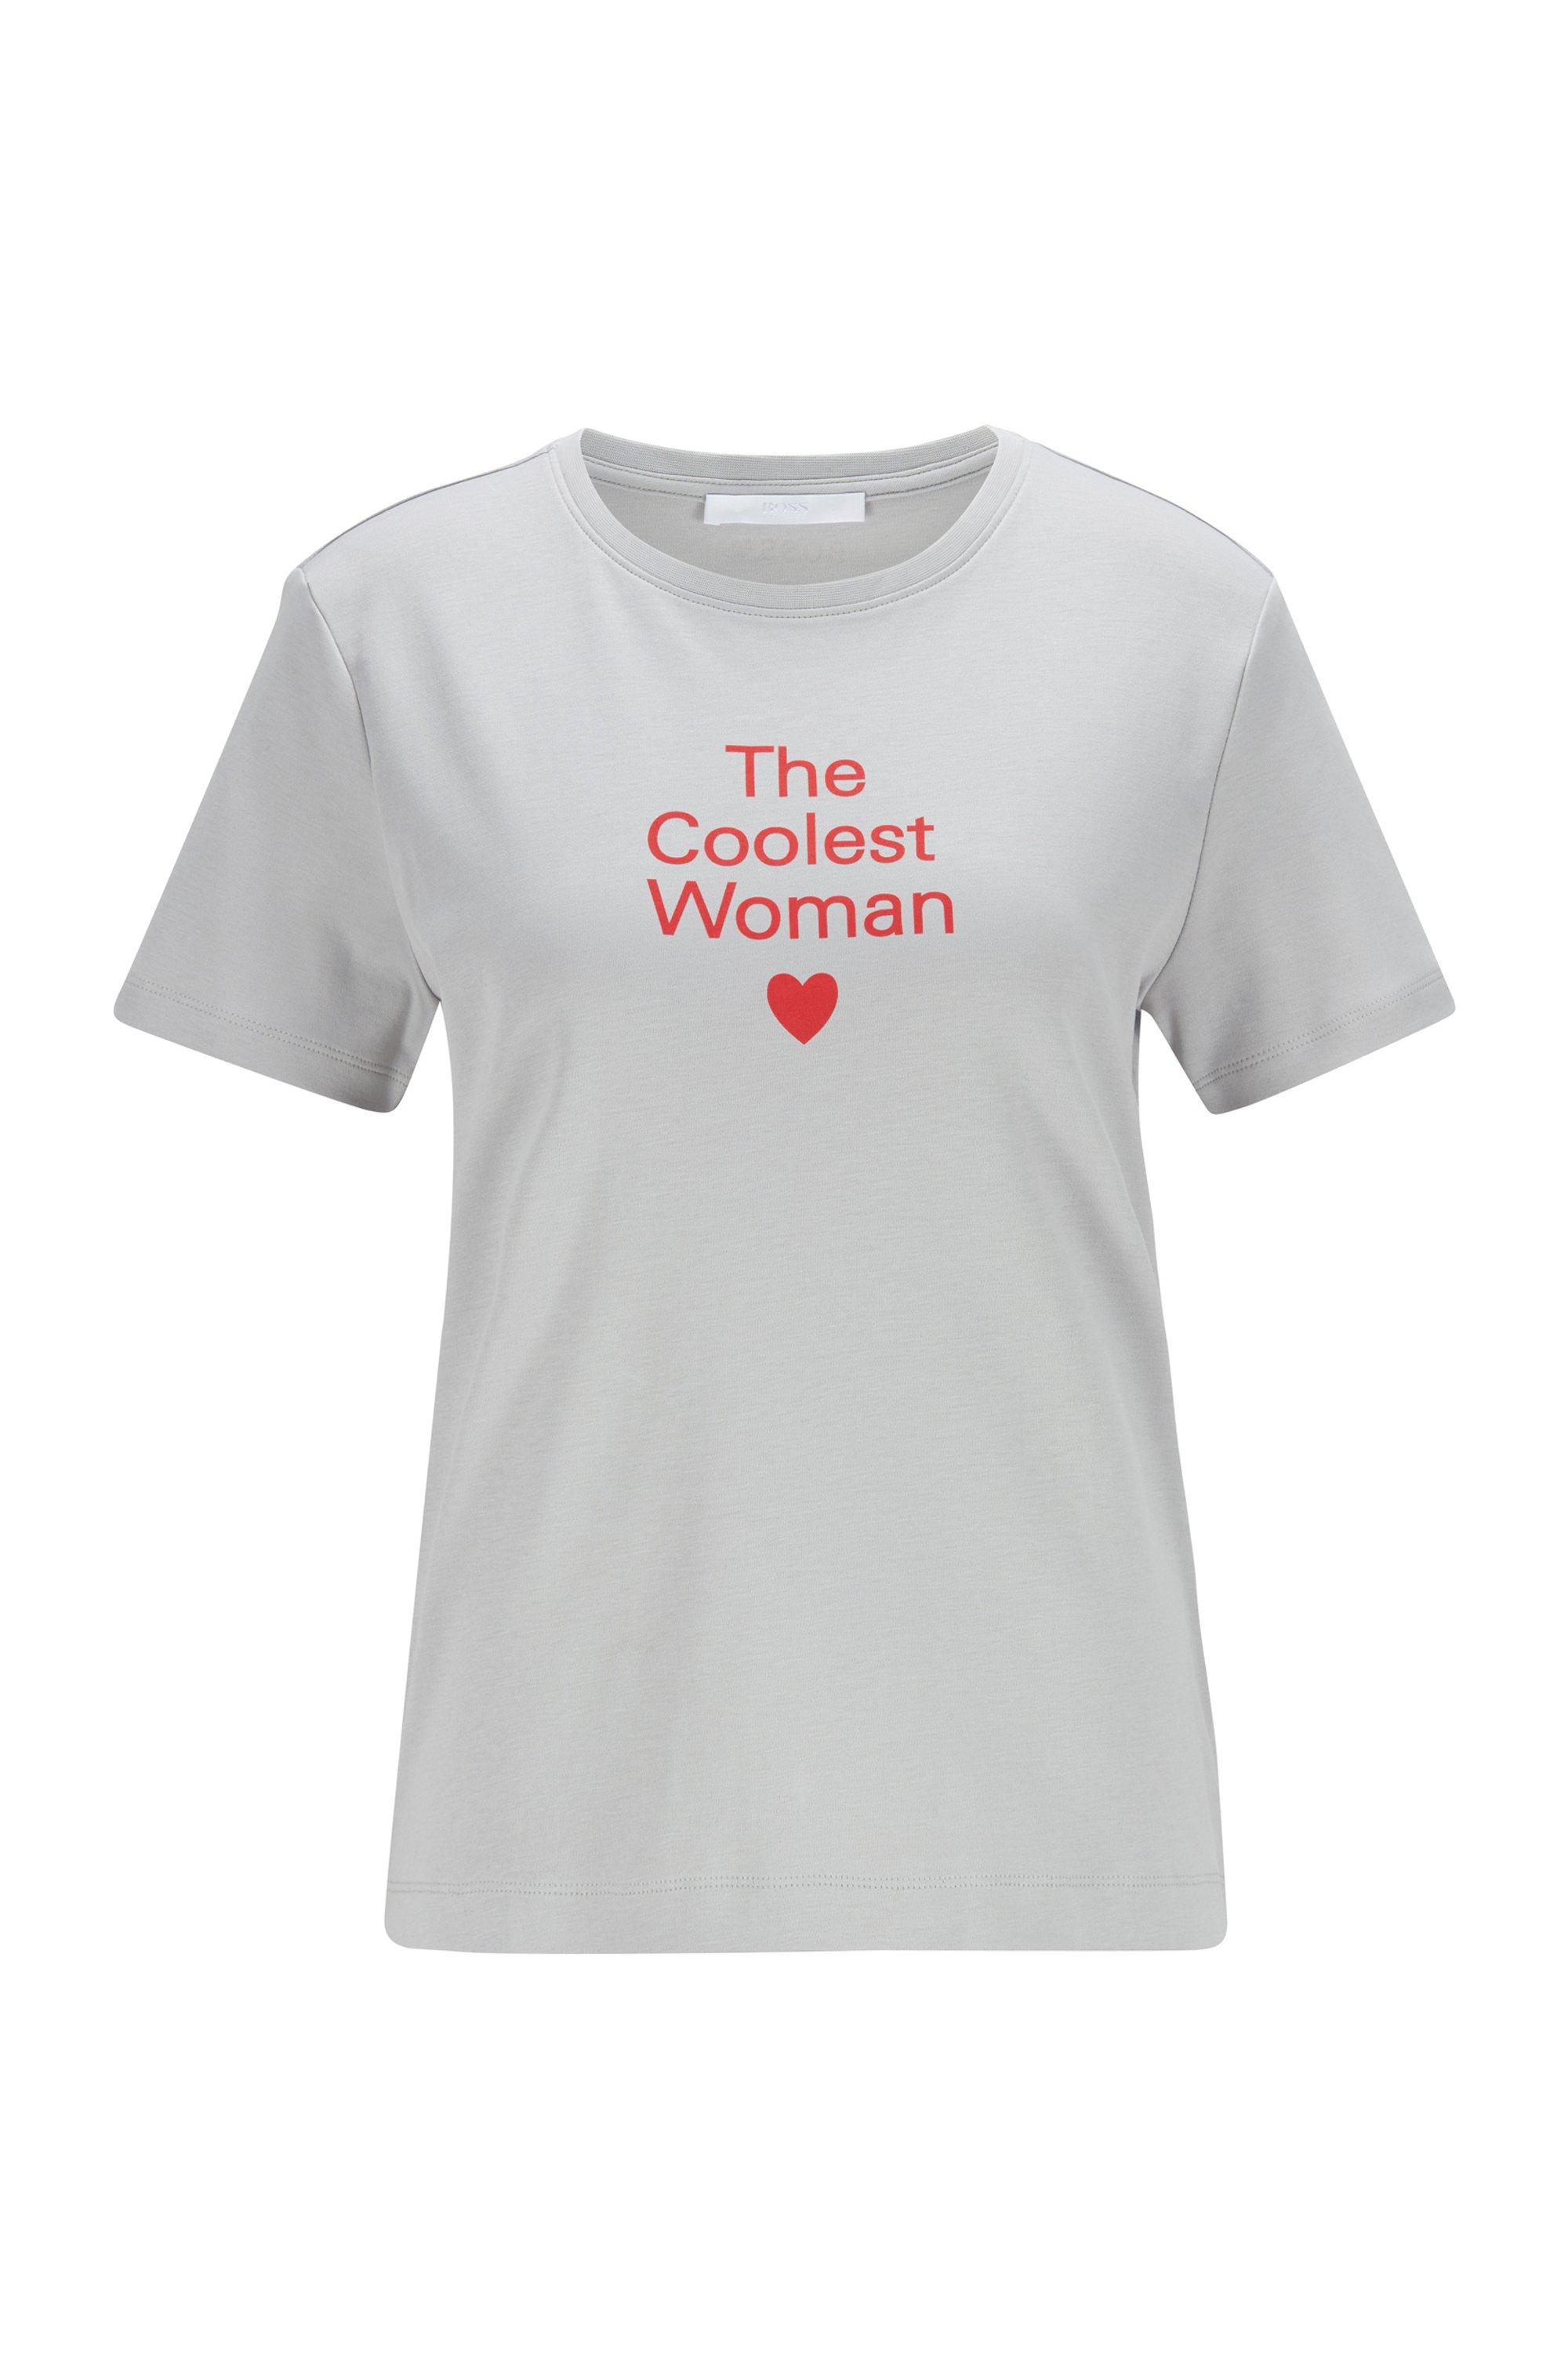 Crew-neck slogan T-shirt in Supima cotton, Silver